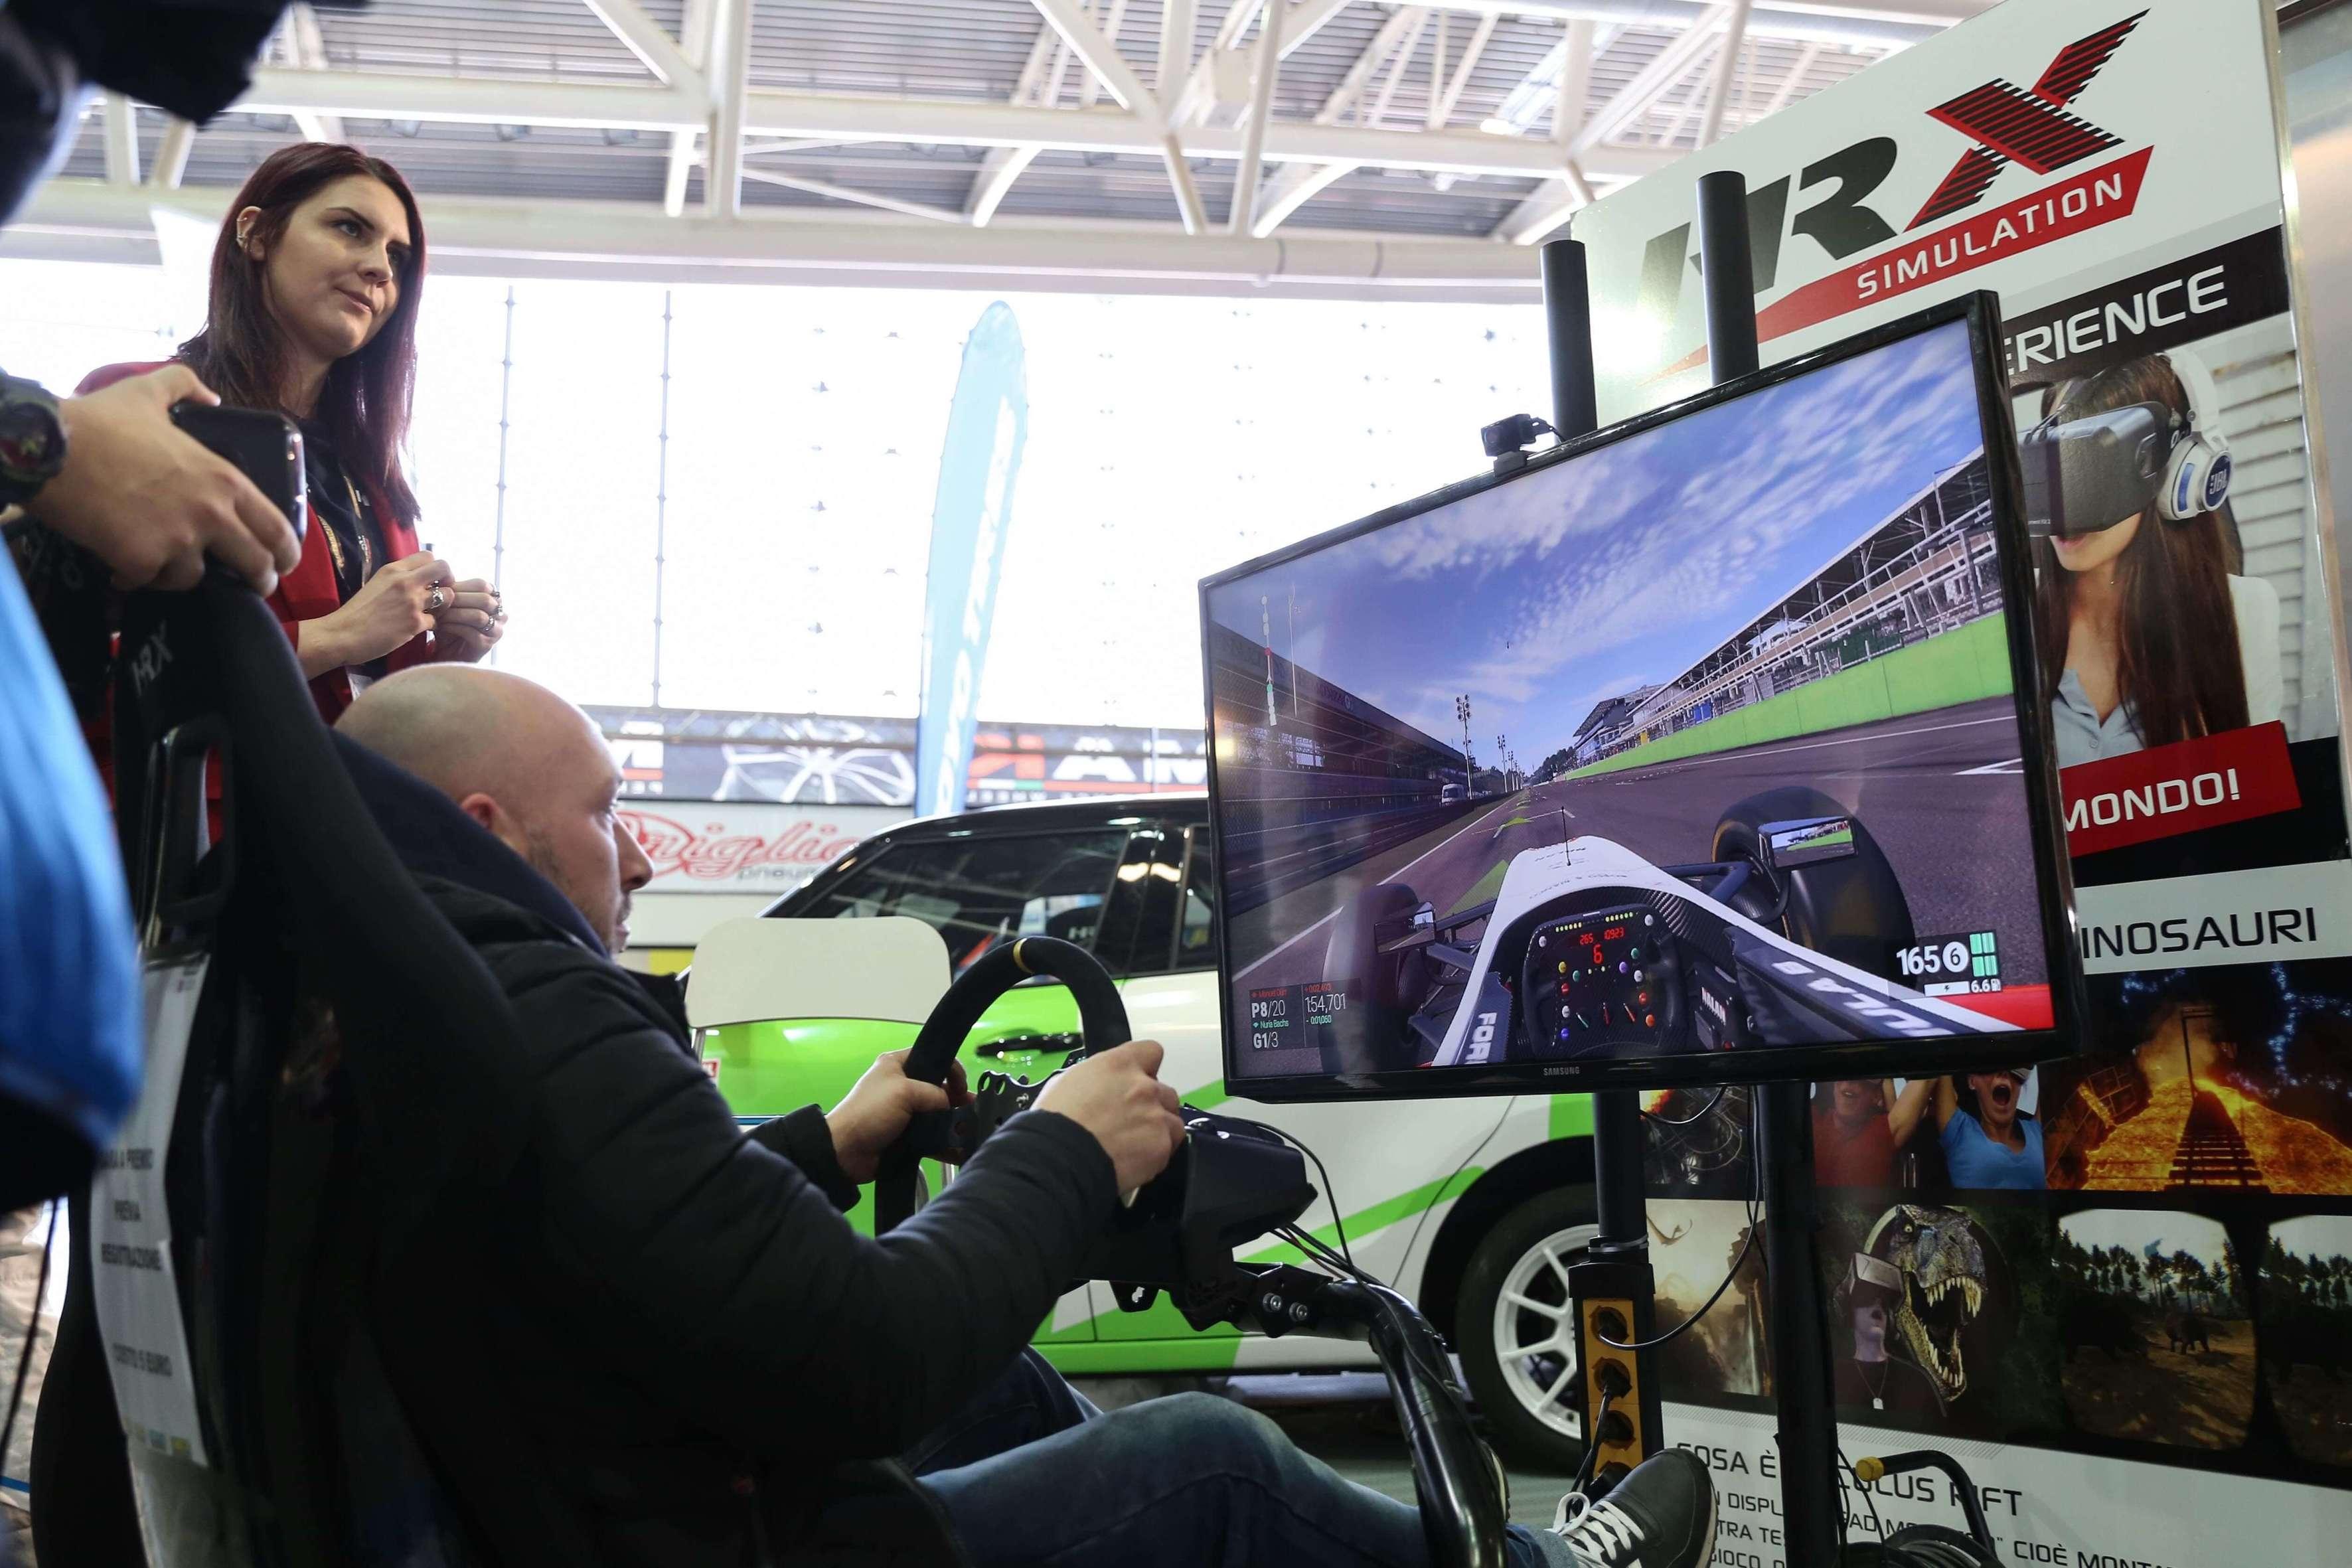 automotoracing-simulazione-guida